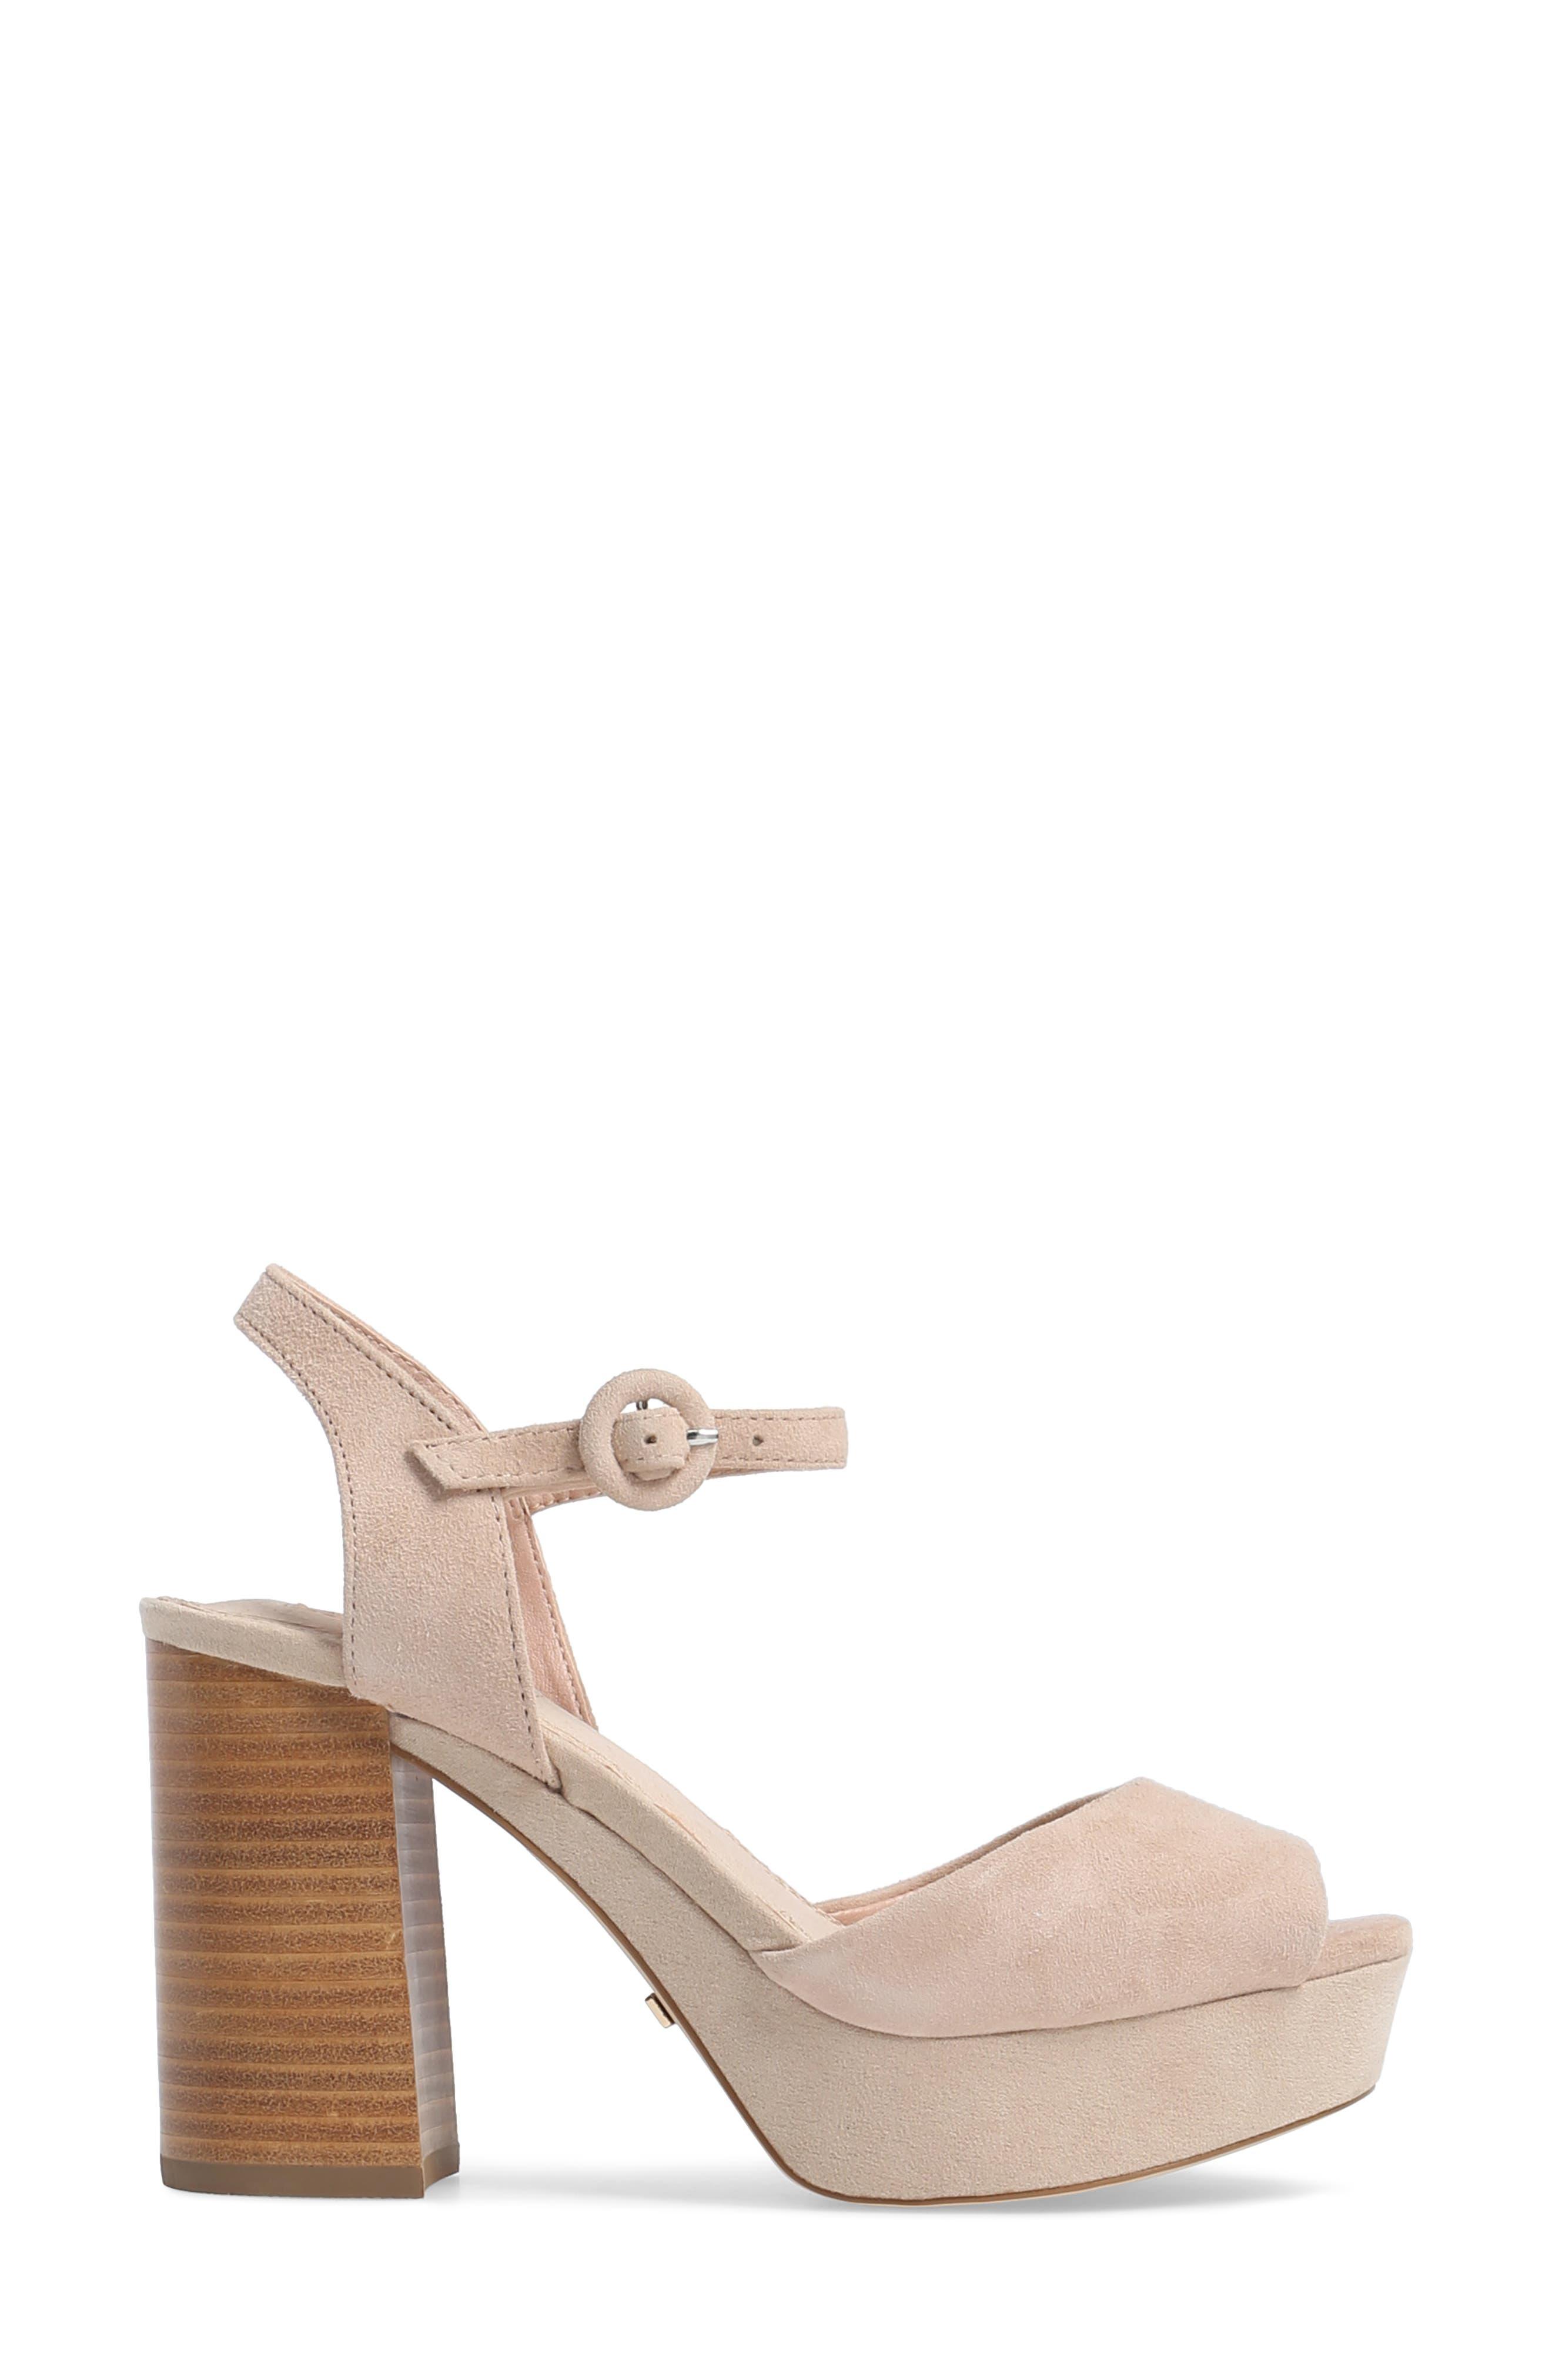 'Lana' Chunky Platform Sandal,                             Alternate thumbnail 3, color,                             250